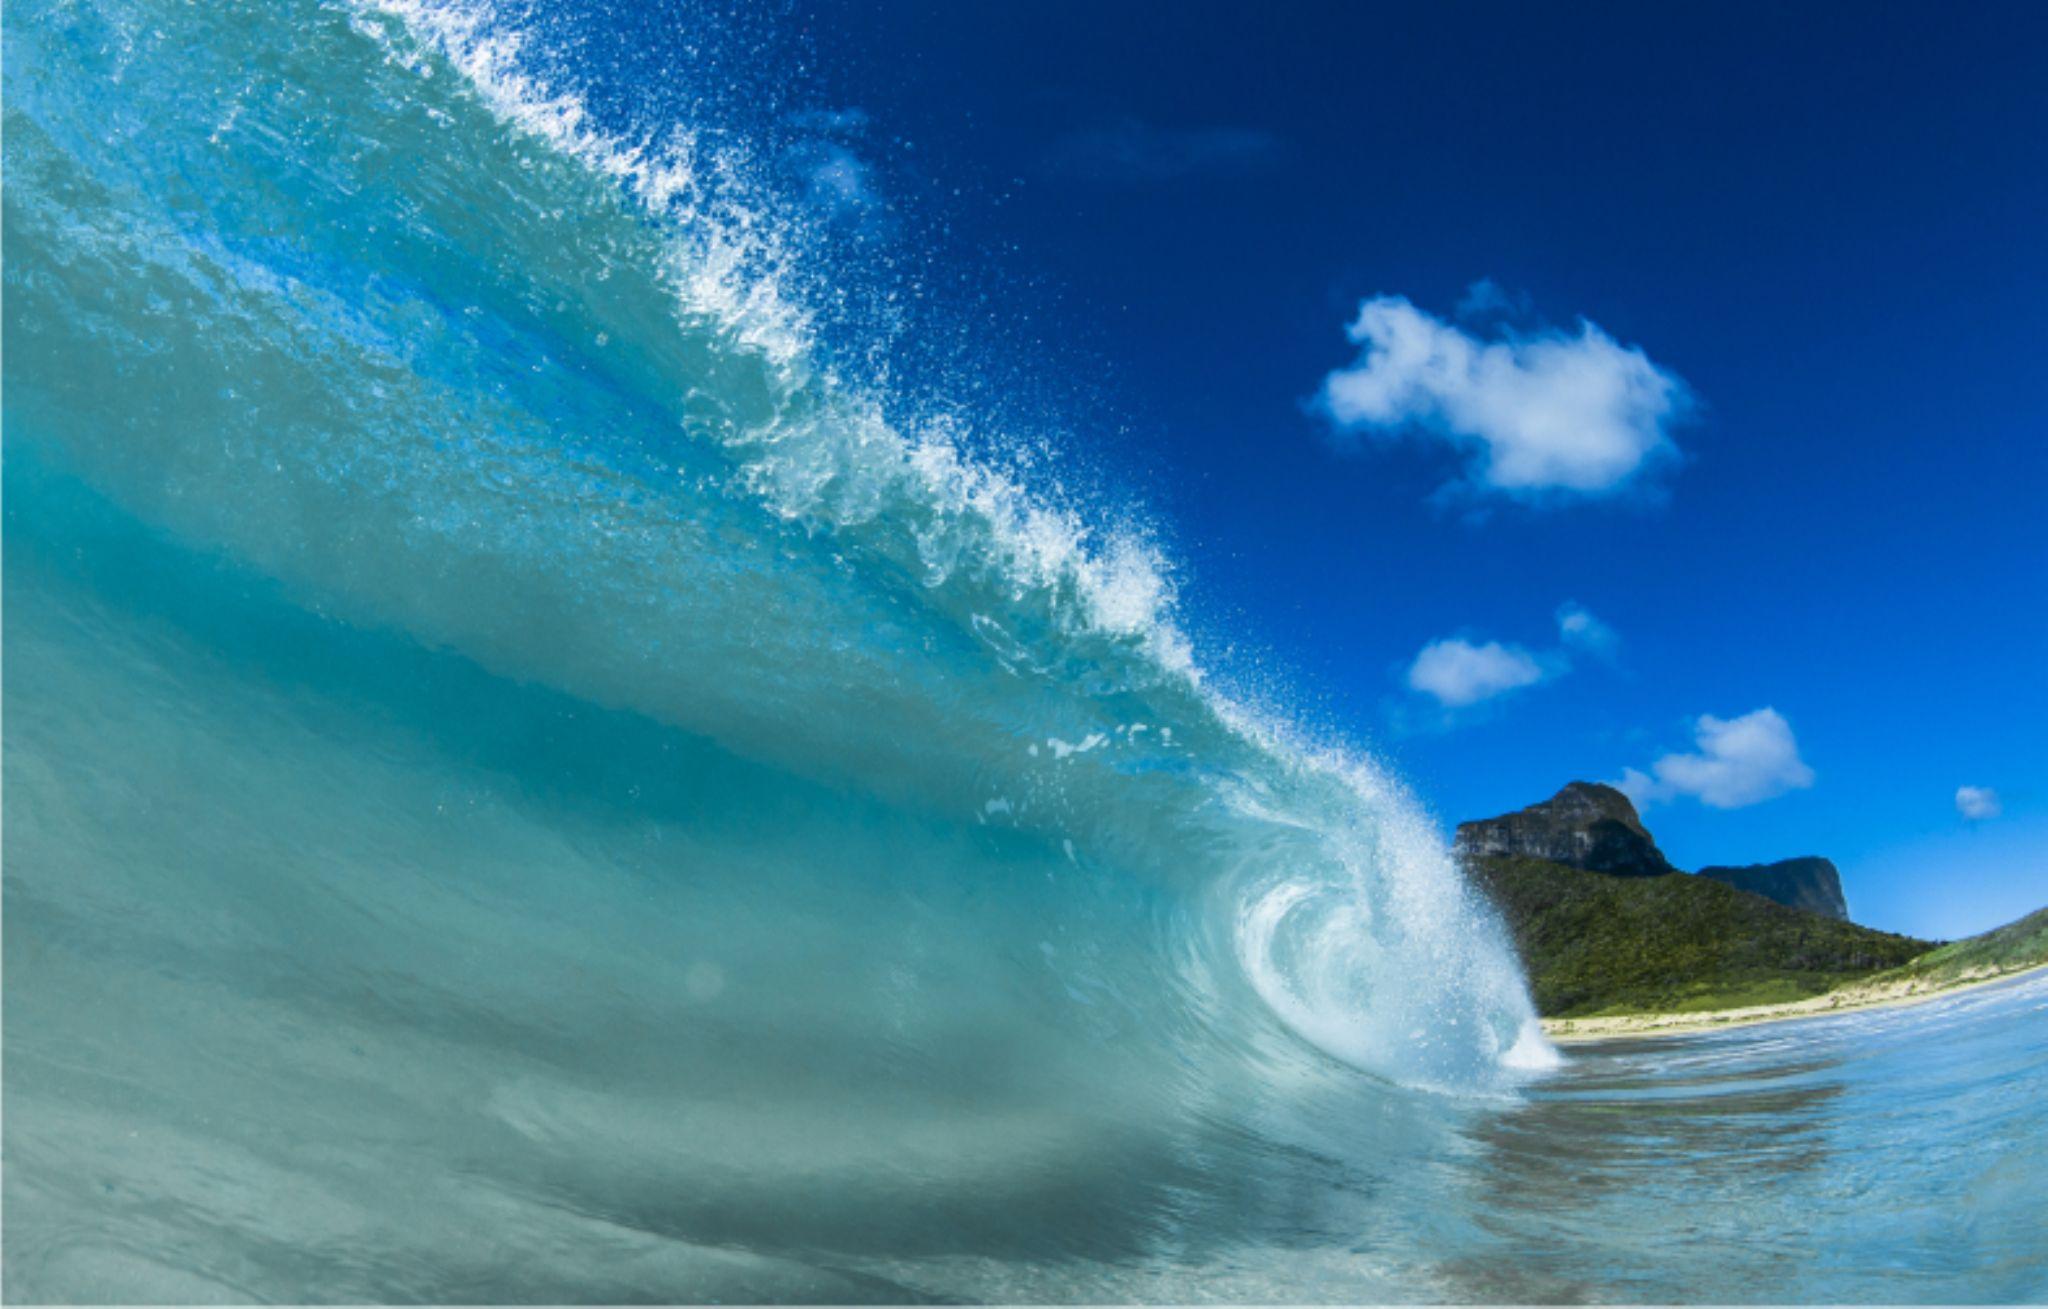 Island barrel by kerry.playford - coastal candy photography